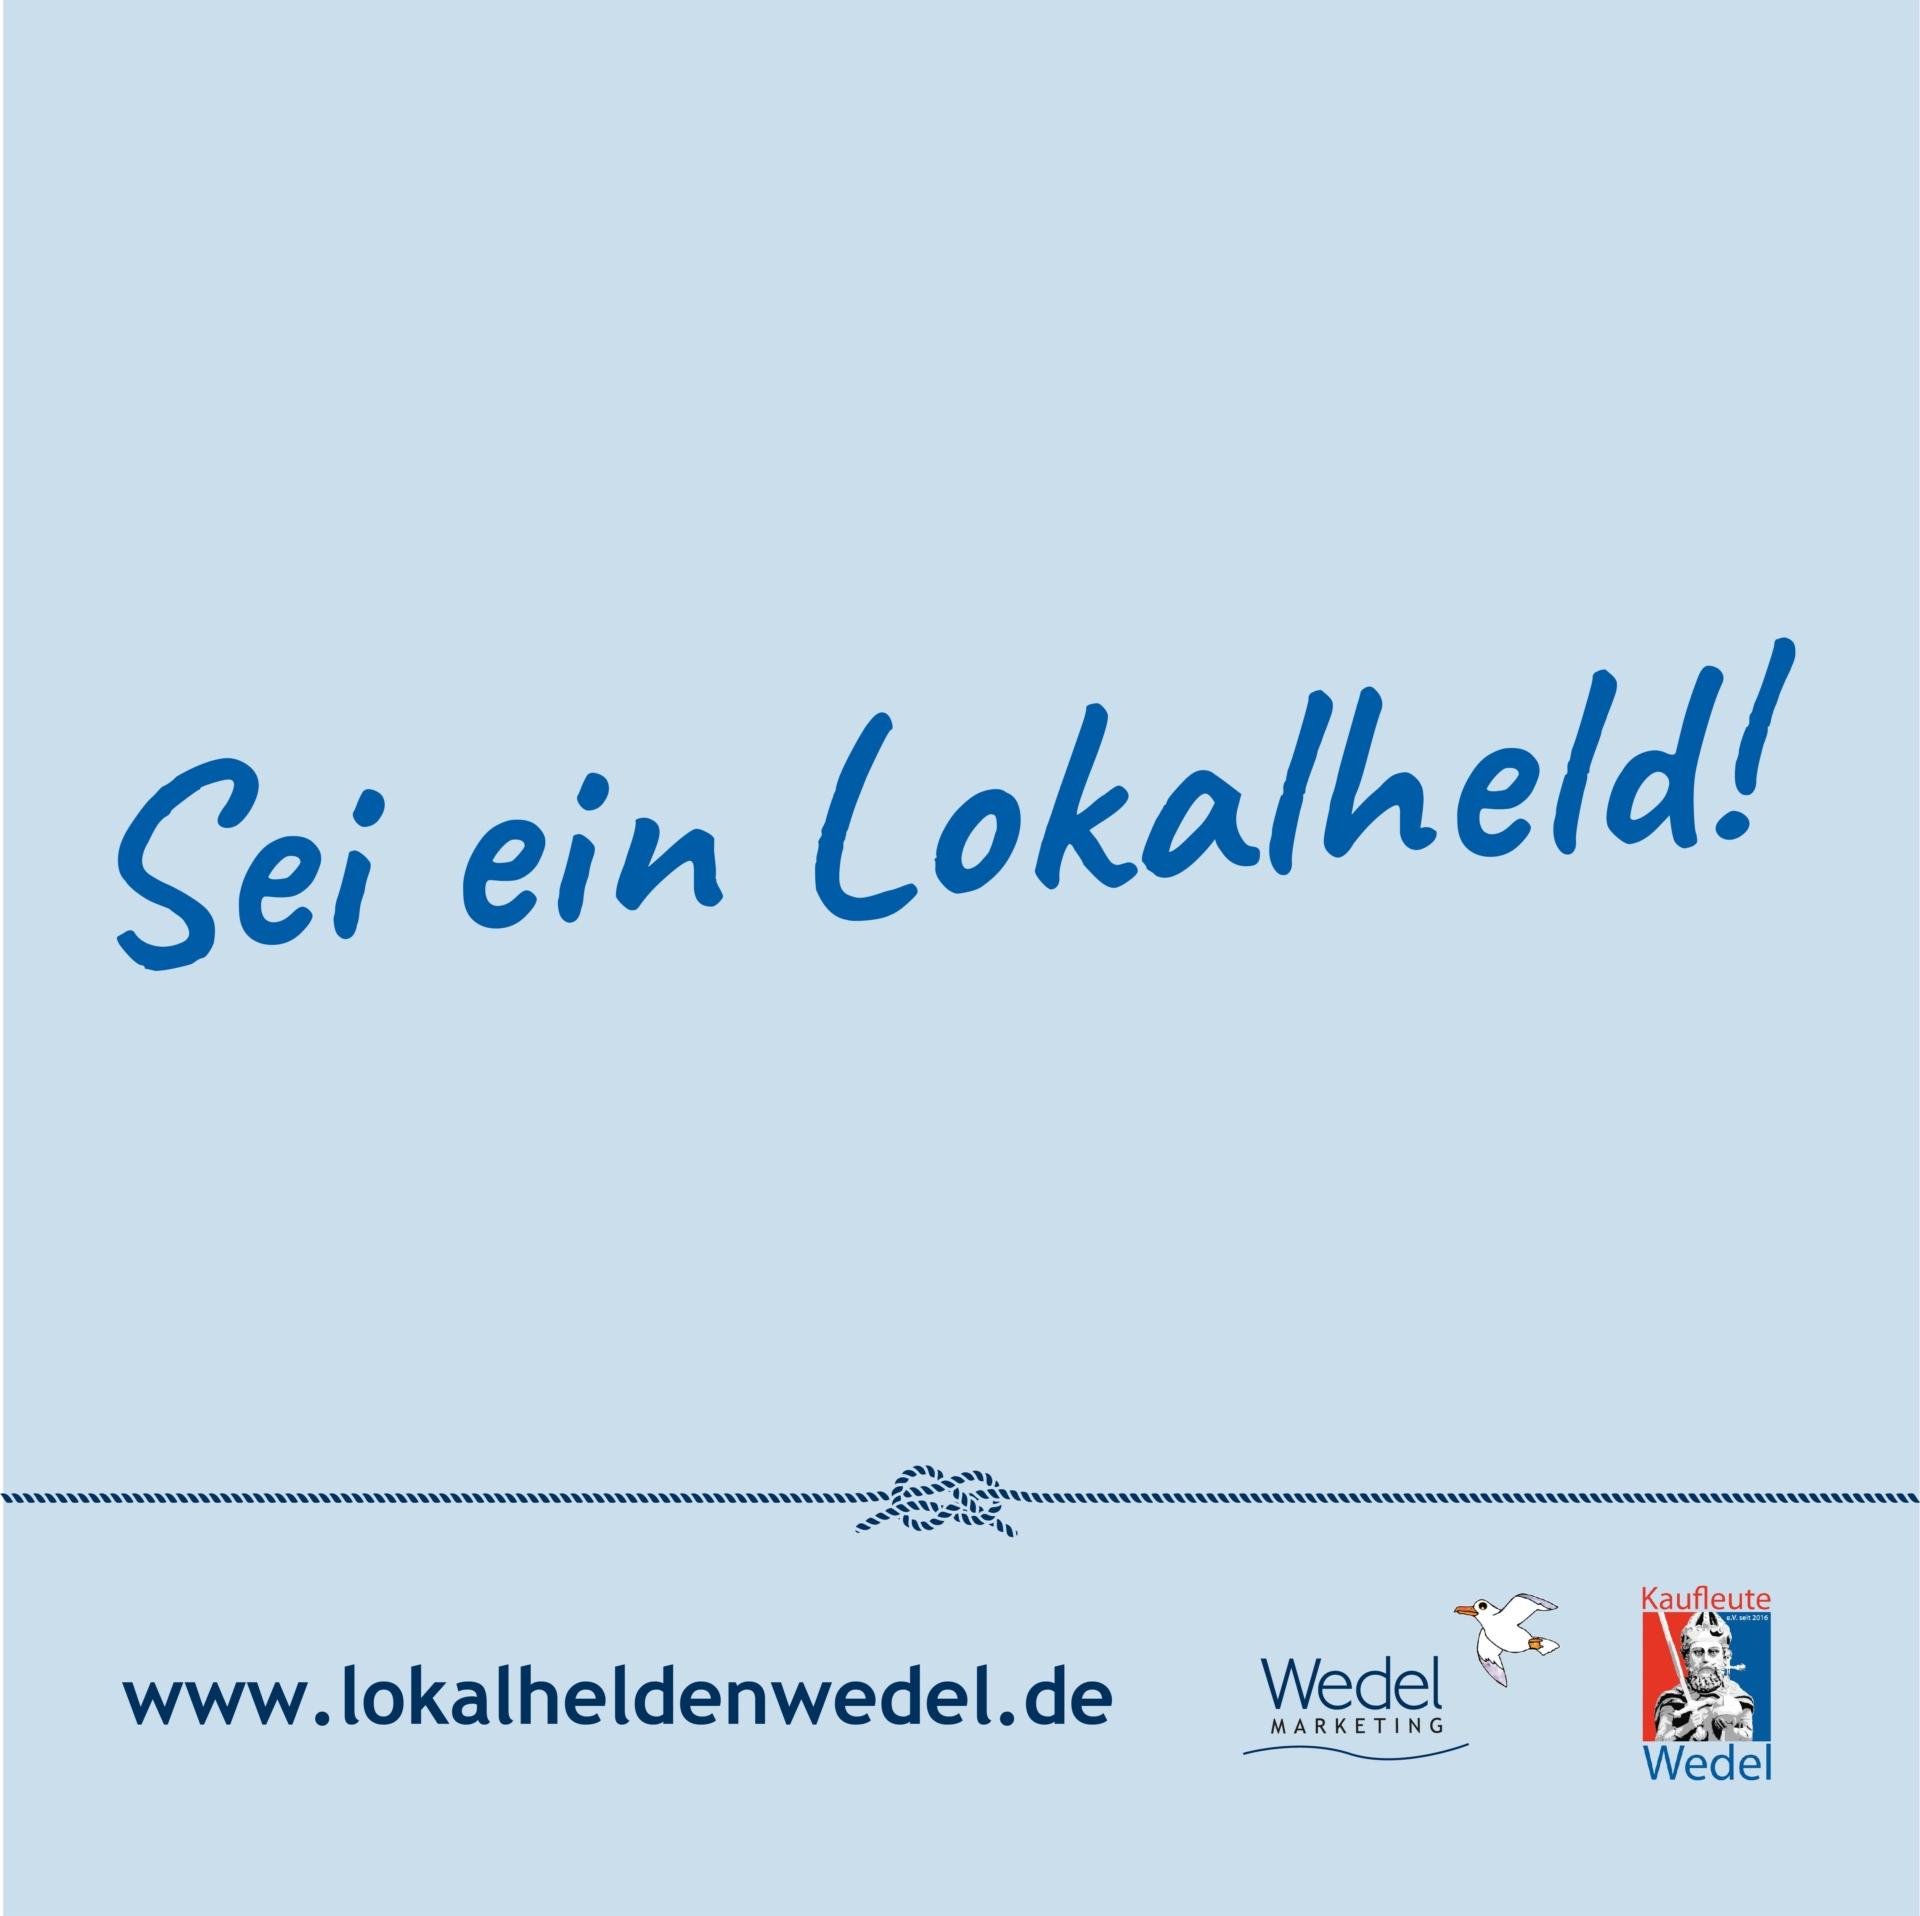 Mein-Wedel-Stadtsparkasse-Wedel-Kaufleute-Wedel-Wedel-Marketing-Sei-ein-Lokalheld-Logo